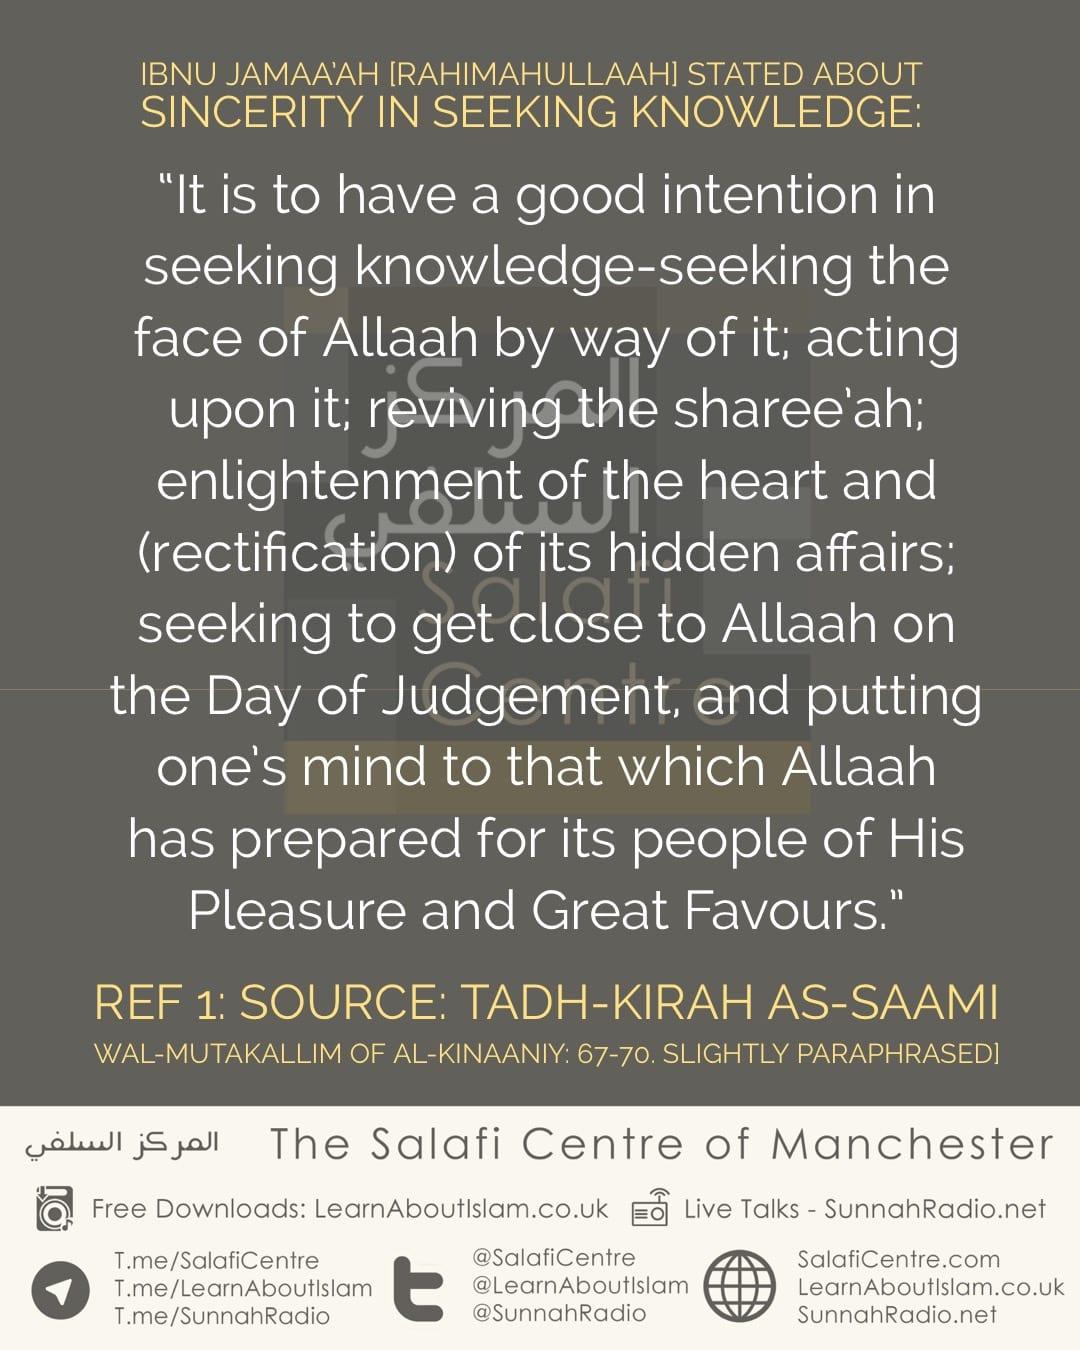 Sincerity in The Path of Seeking Knowledge- by Ibn Jamaa'ah and Shaikh Uthaymeen [rahimahumallaah]